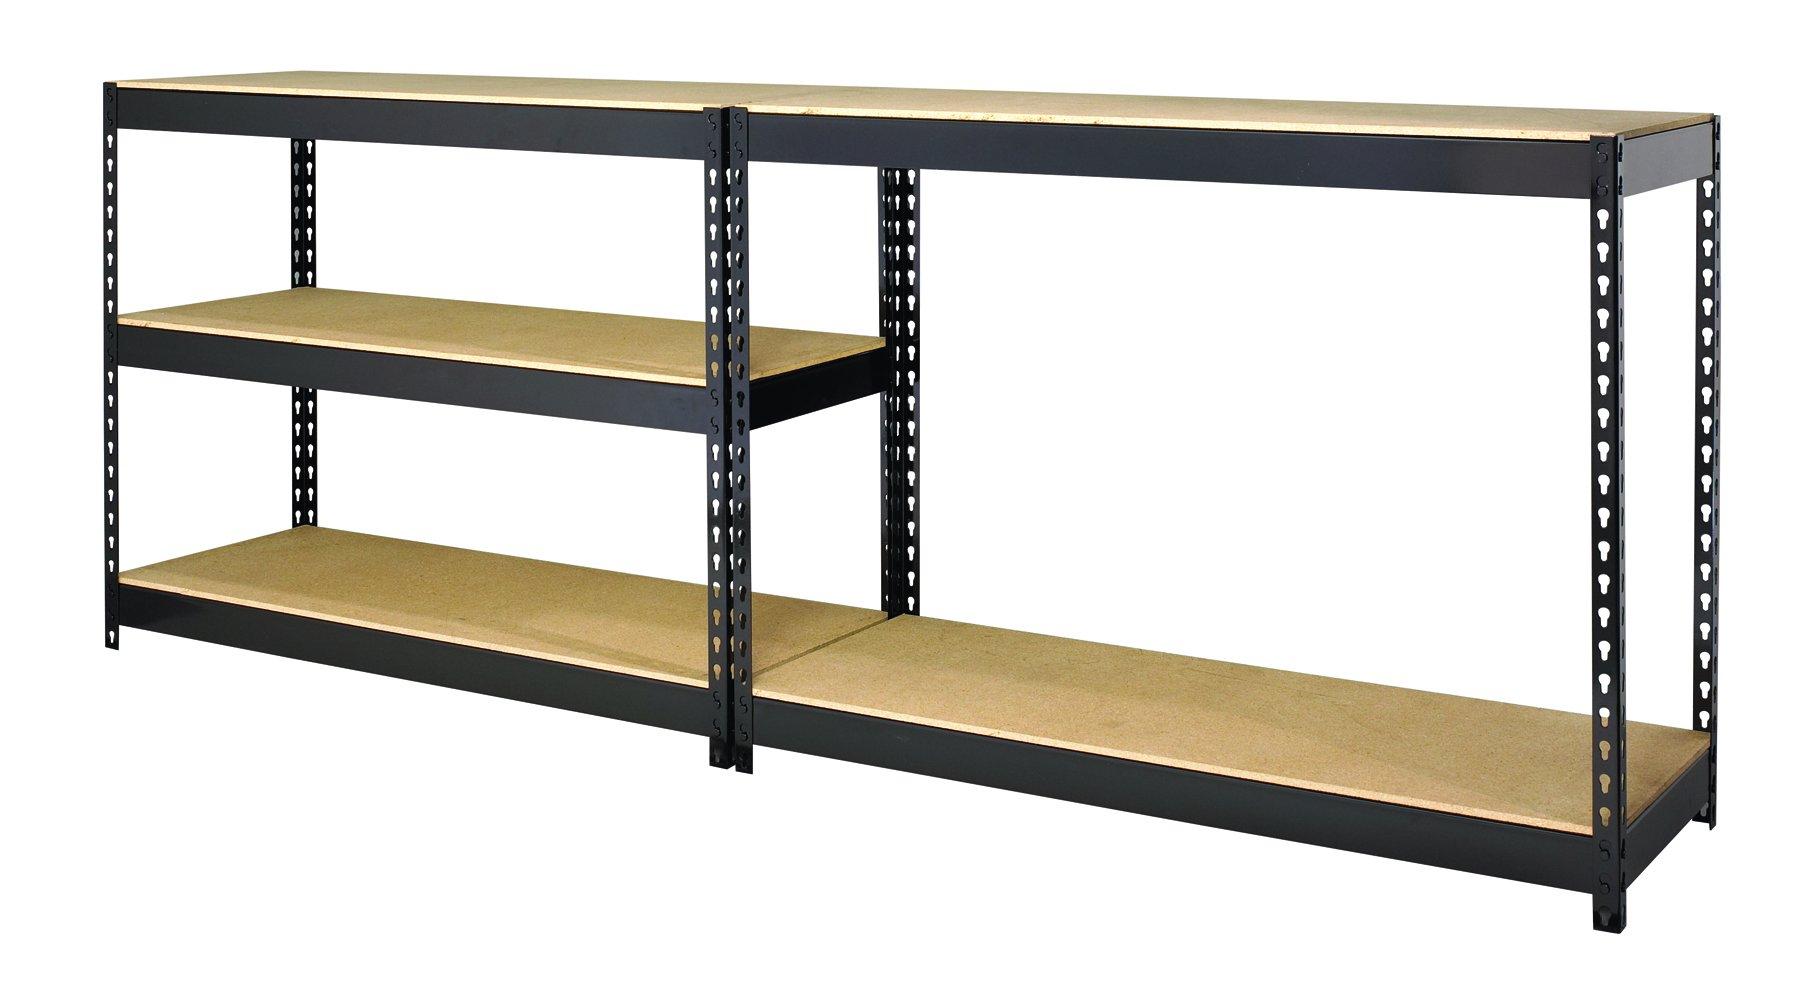 Hirsh Industries Office Dimensions Riveted Steel Shelving 4-Shelf Unit, 30'' W x 16'' D x 60'' H, Black by Hirsh Industries (Image #2)